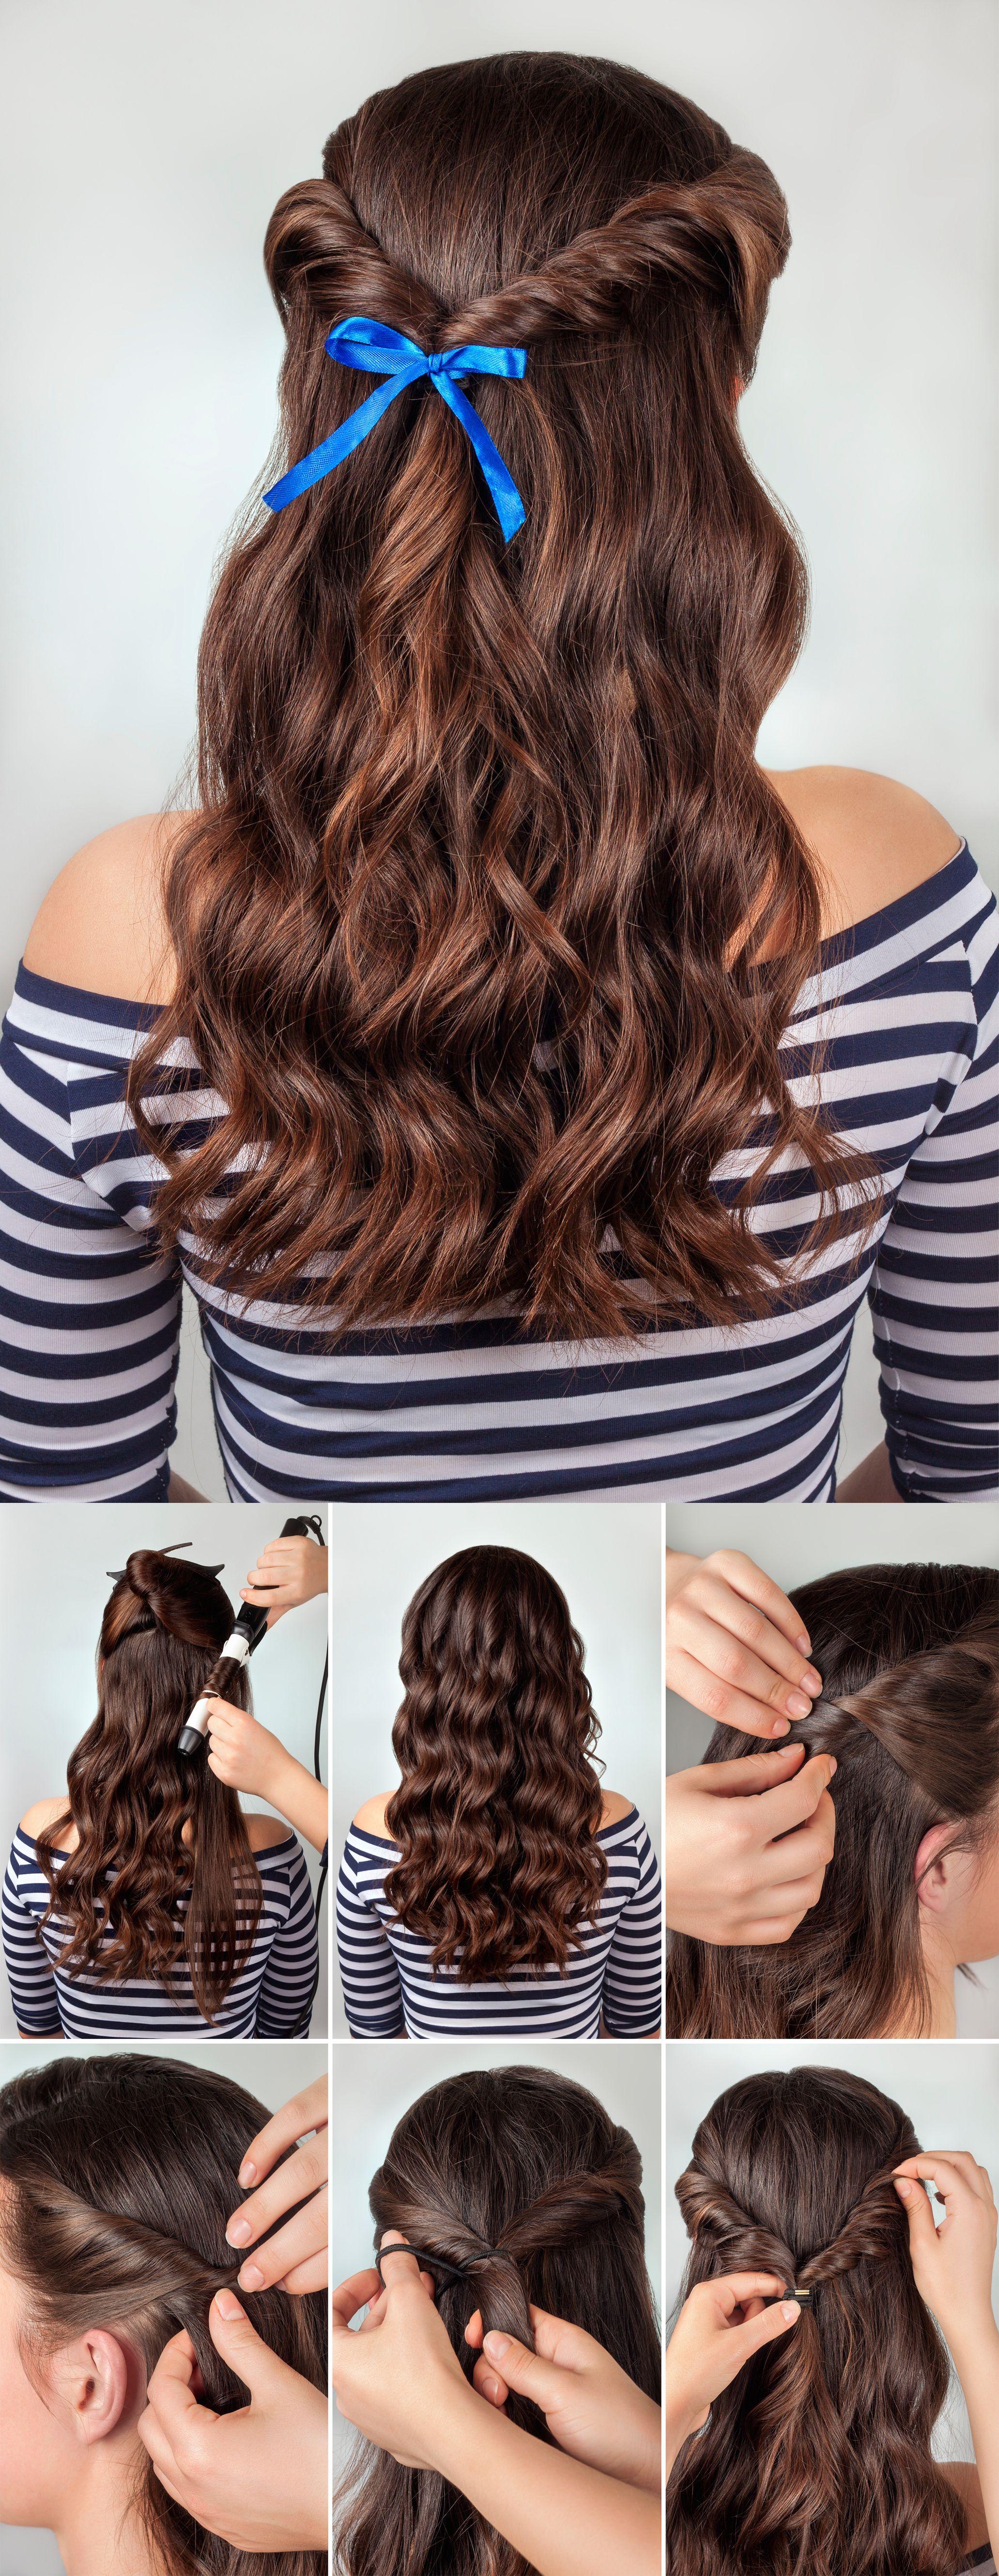 peinados con minilazo - semirecogido